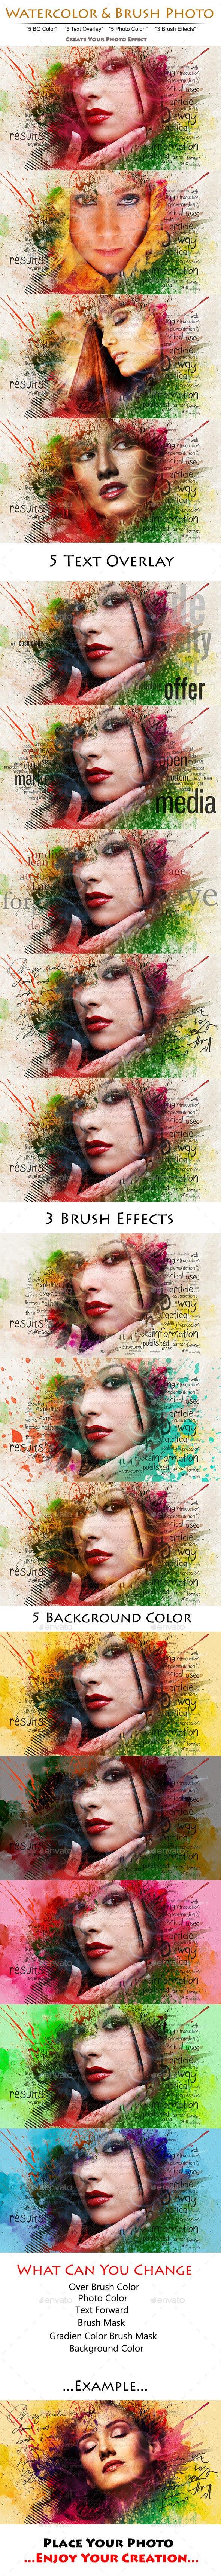 Watercolor & Brush Photo